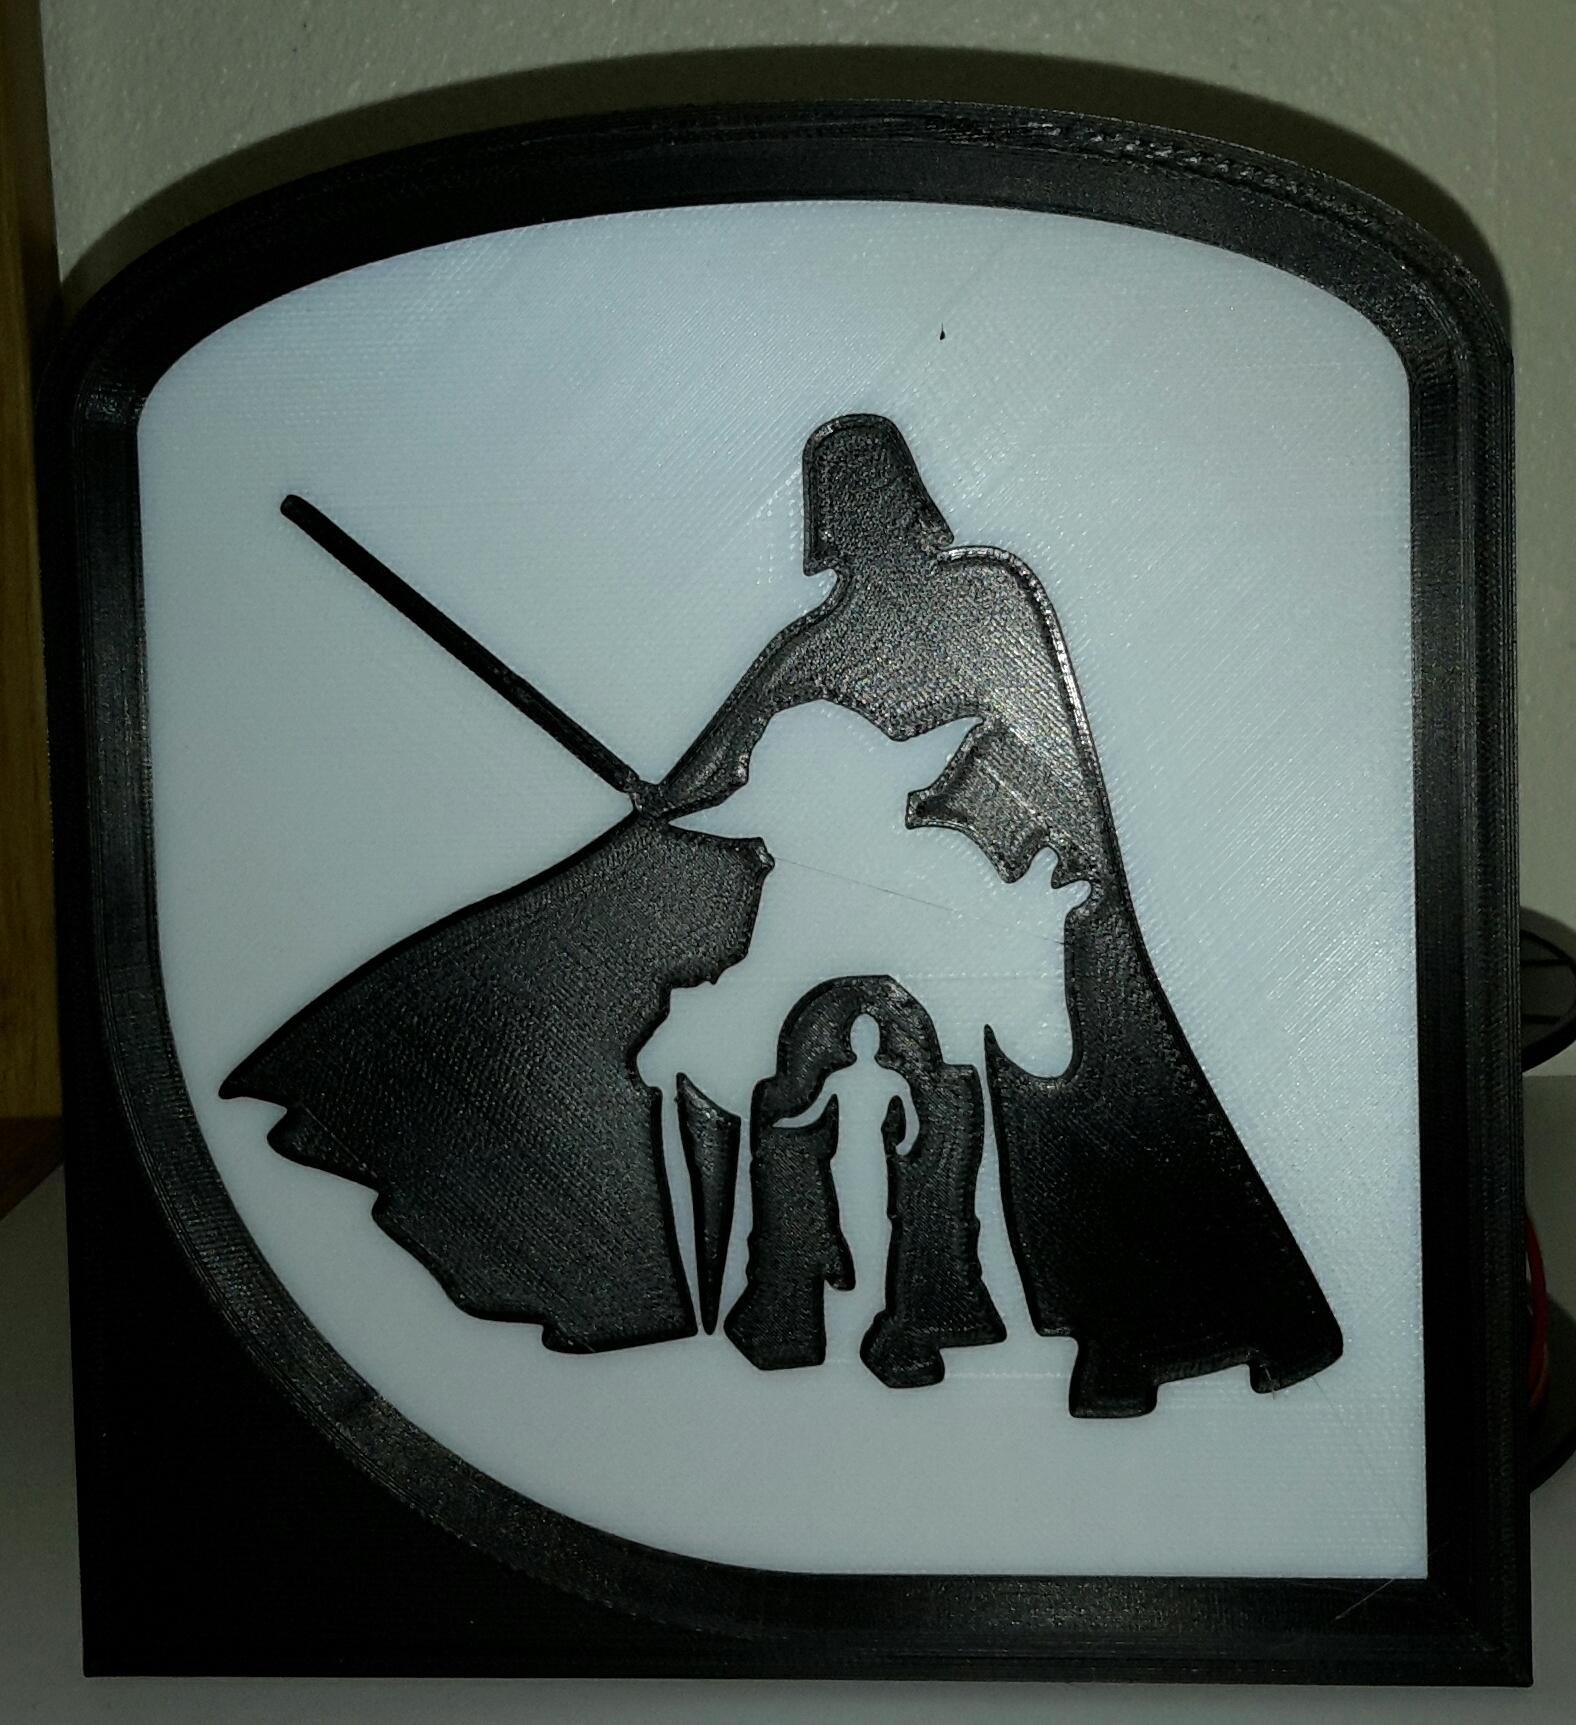 Studio_20190321_173826.jpg Télécharger fichier STL gratuit StarWars - Dark Vador - Dark Vader - Yoda - R2D2 - C3PO • Design imprimable en 3D, yb__magiic